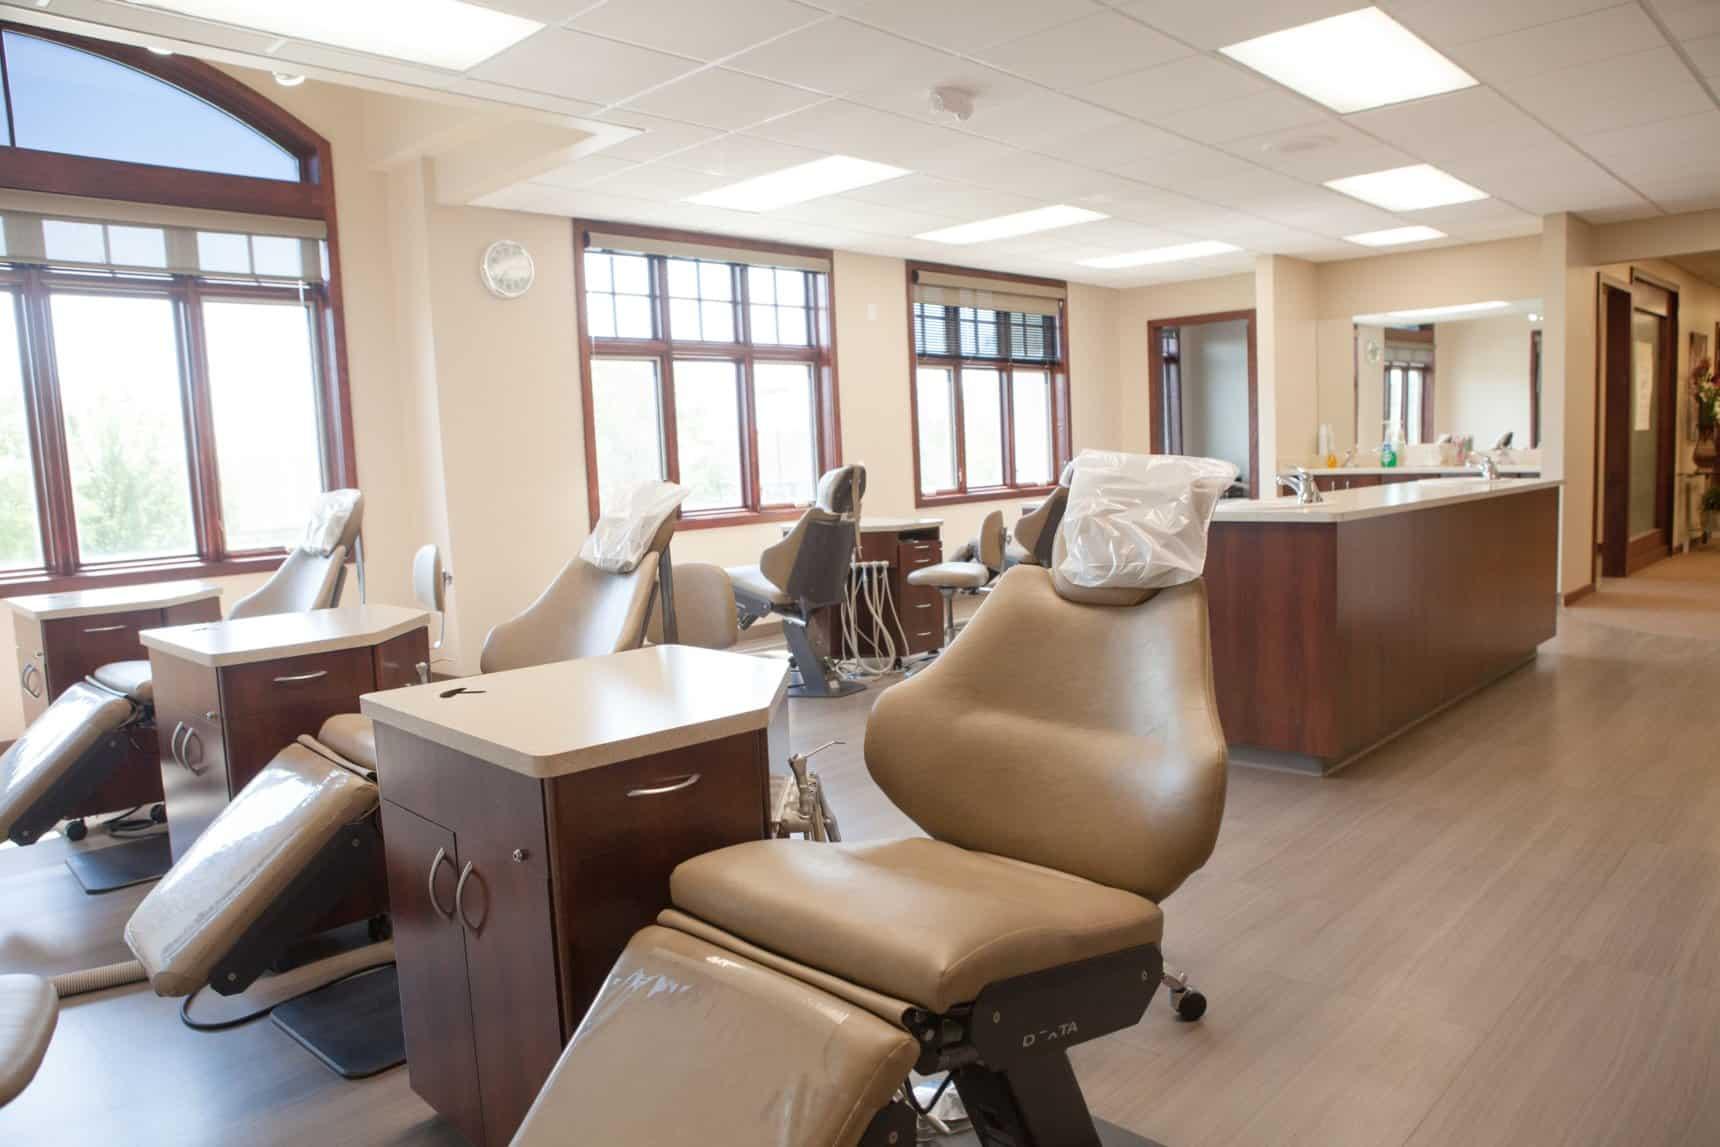 McAllister Orthodontics dental floor